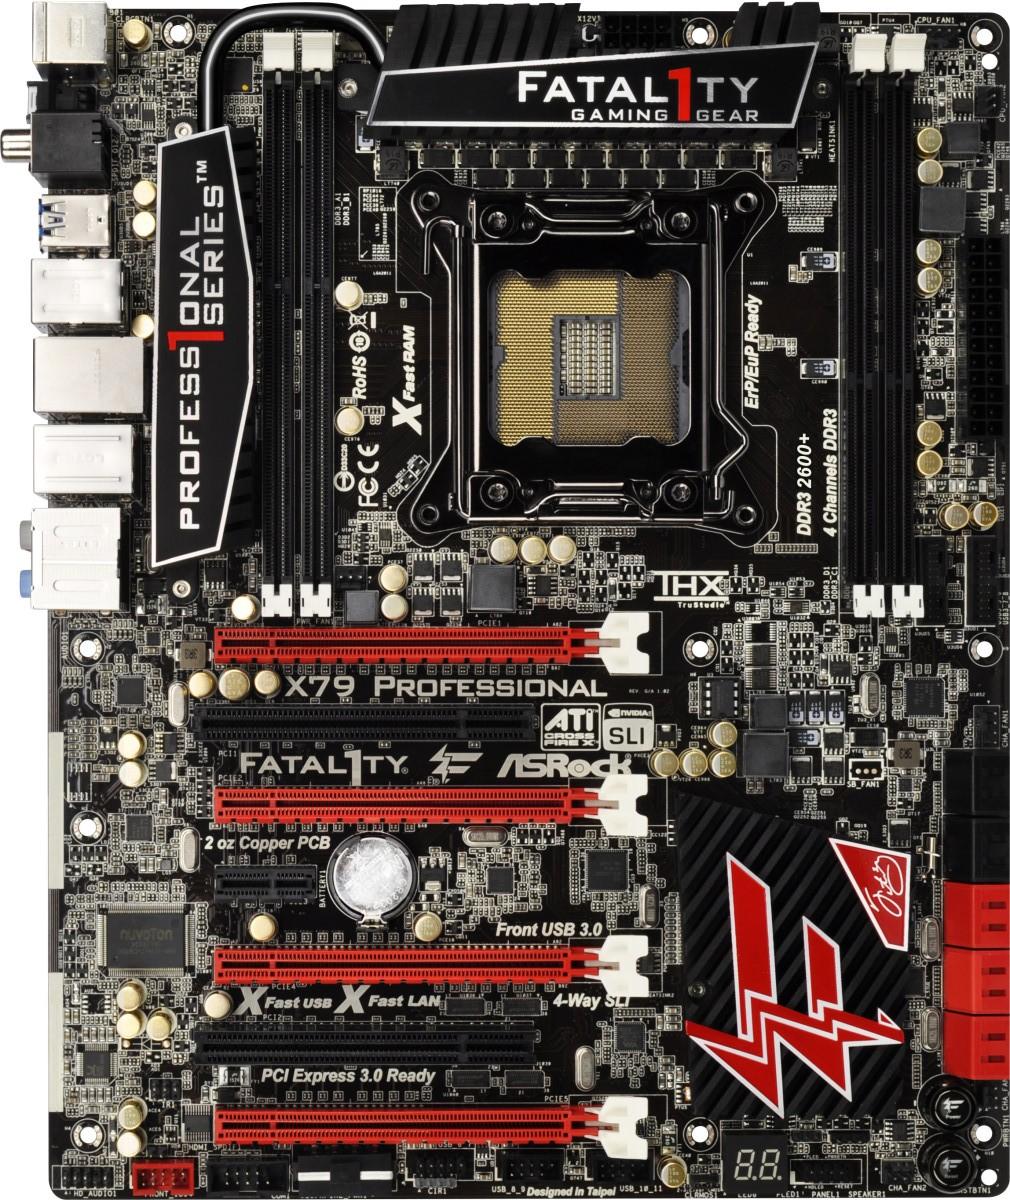 ASROCK FATAL1TY Z77 PROFESSIONAL BROADCOM LAN DRIVERS PC